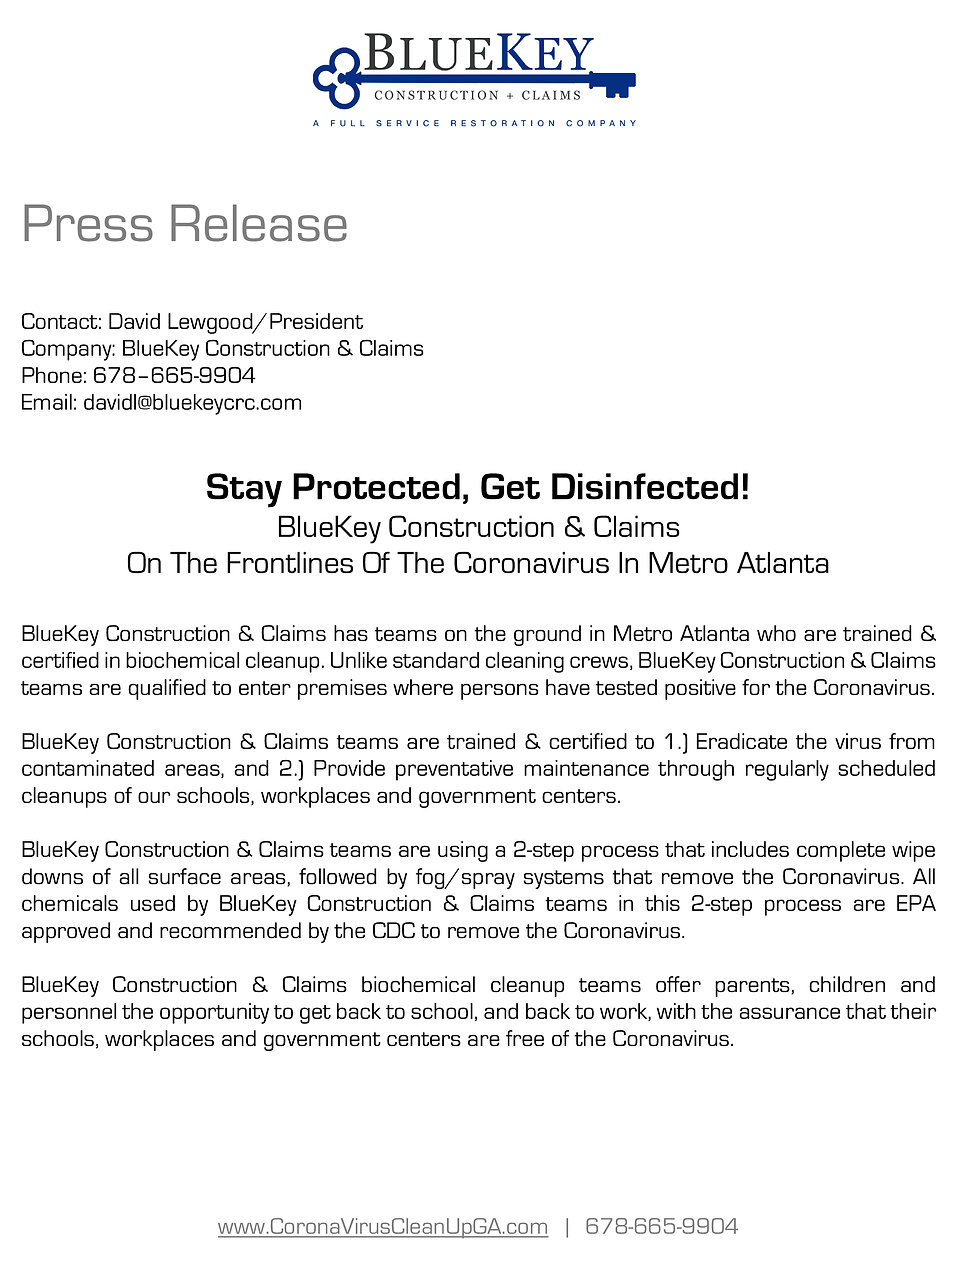 Press Release_BlueKey Coronavirus.jpg